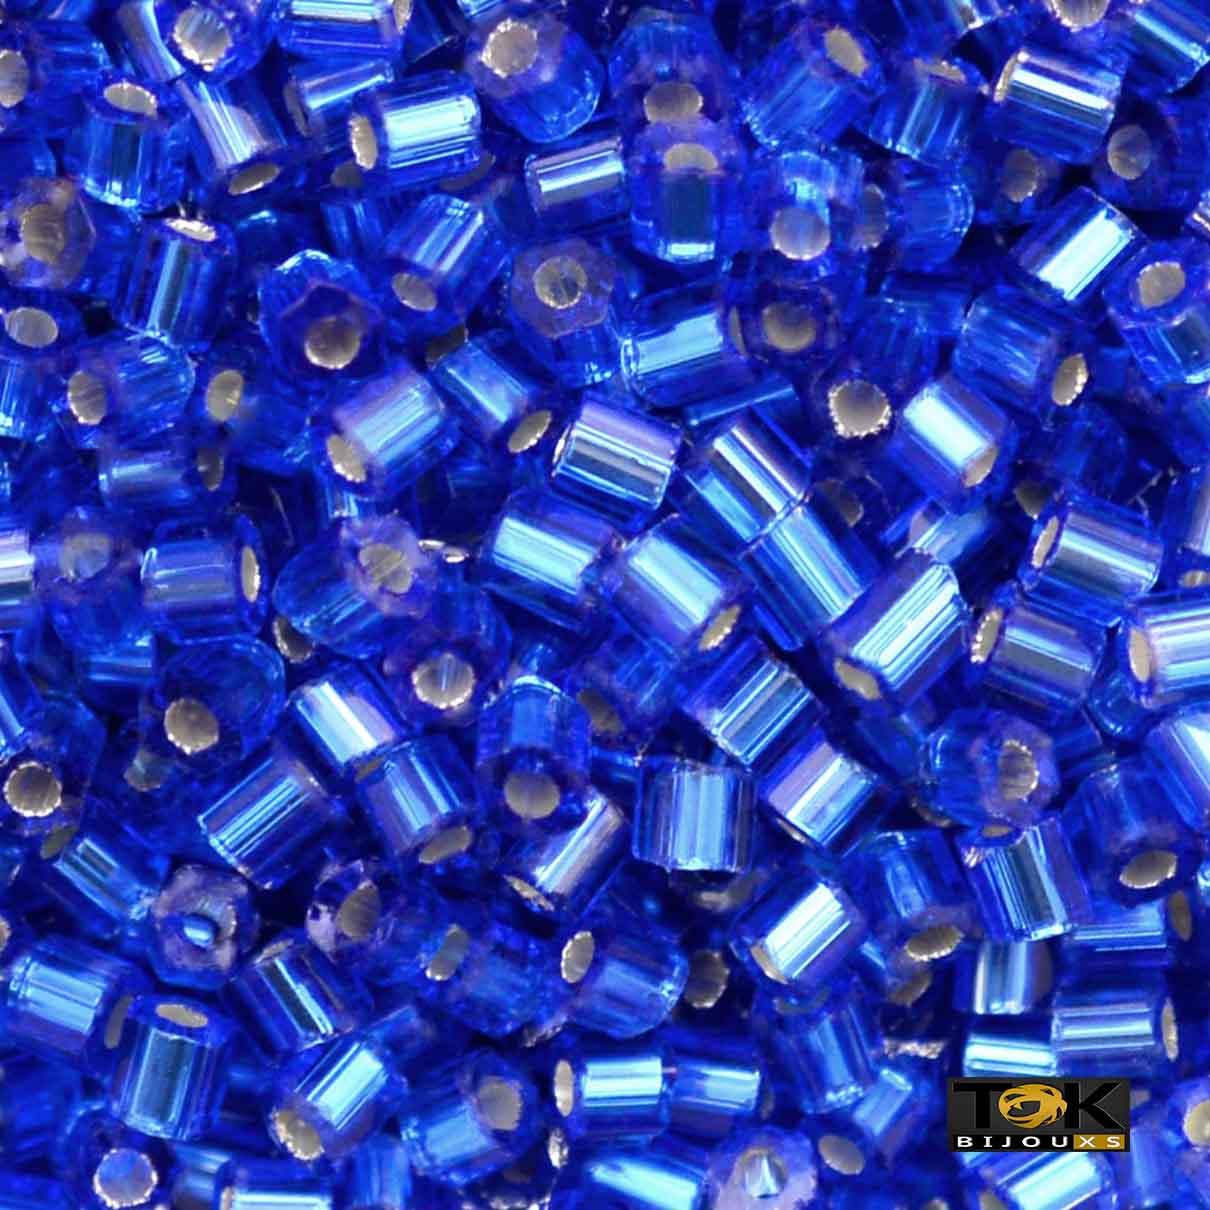 Vidrilho Jablonex Azul Royal Médio Transp Ref.37050  - 500g